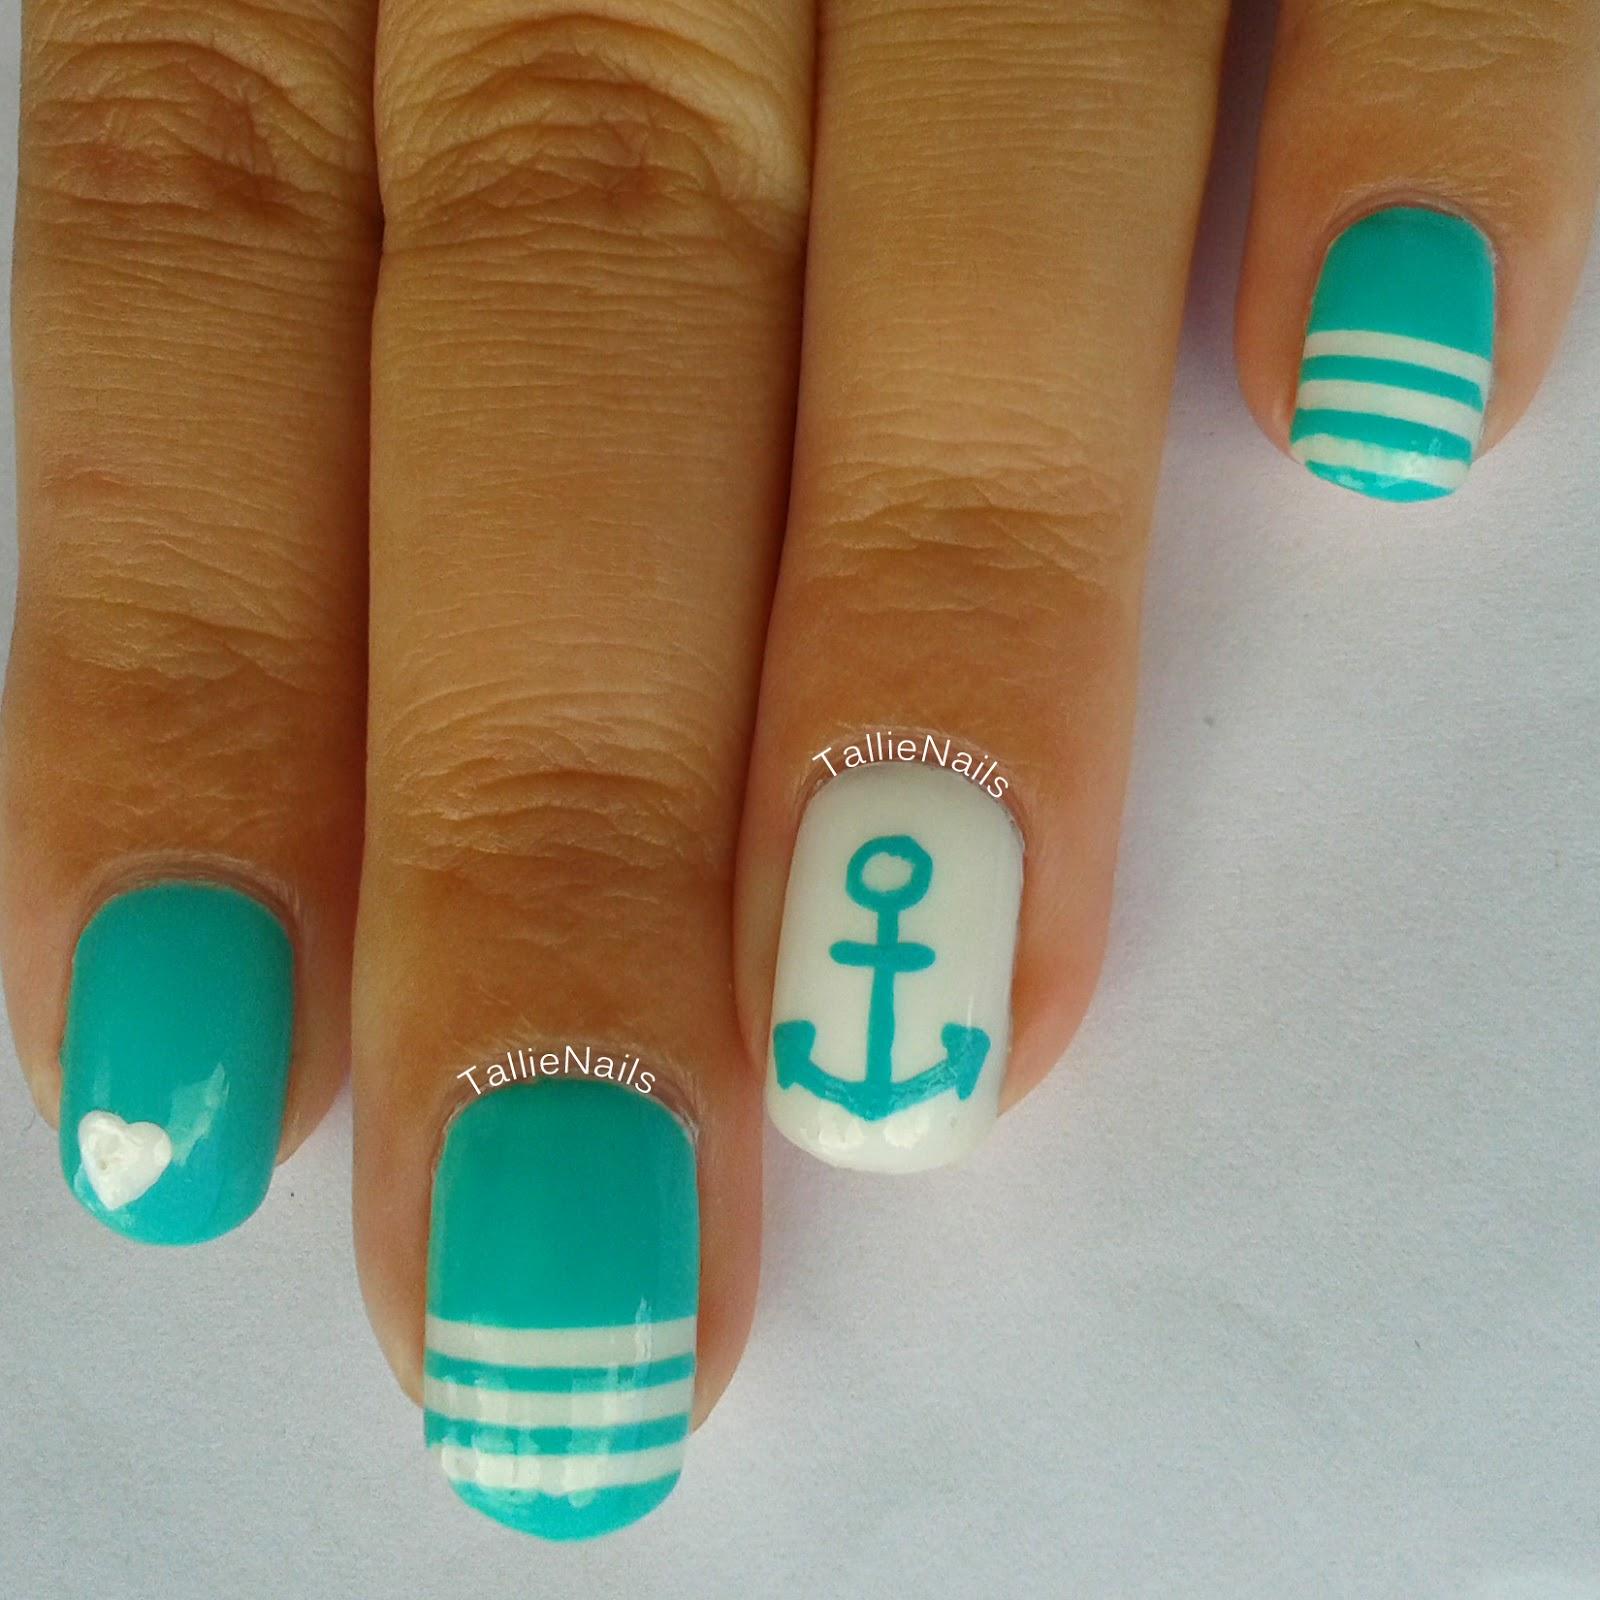 Tallienails: Turquoise Nautical Nails